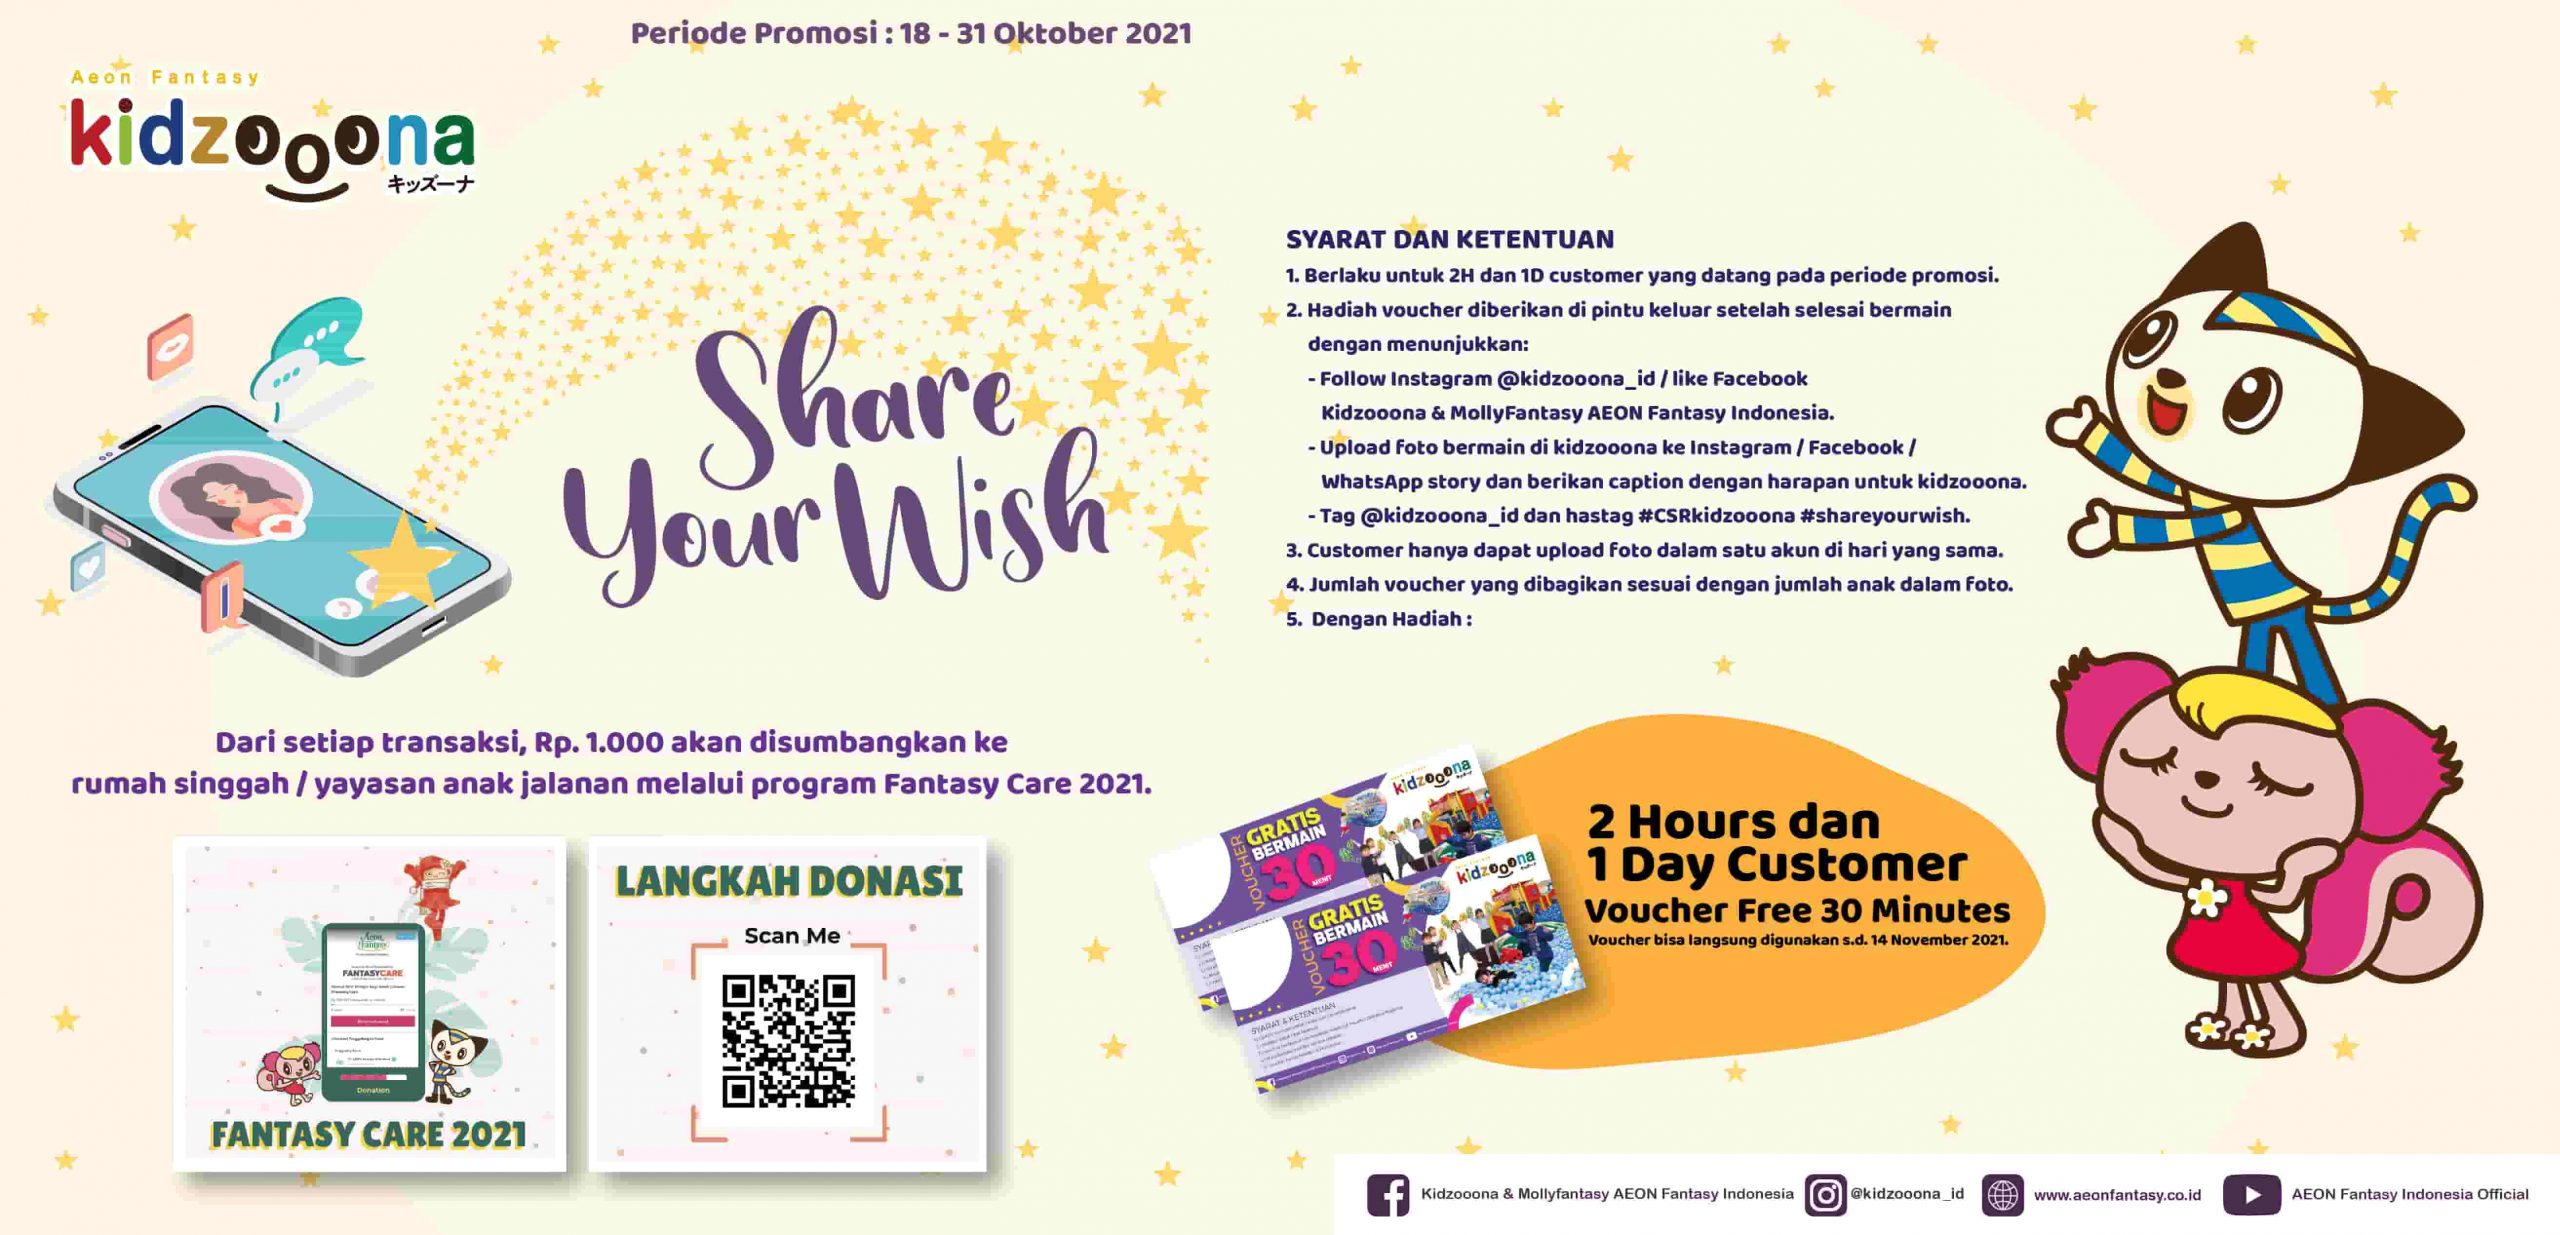 Share Your Wish (Dapatkan voucher 30 menit)